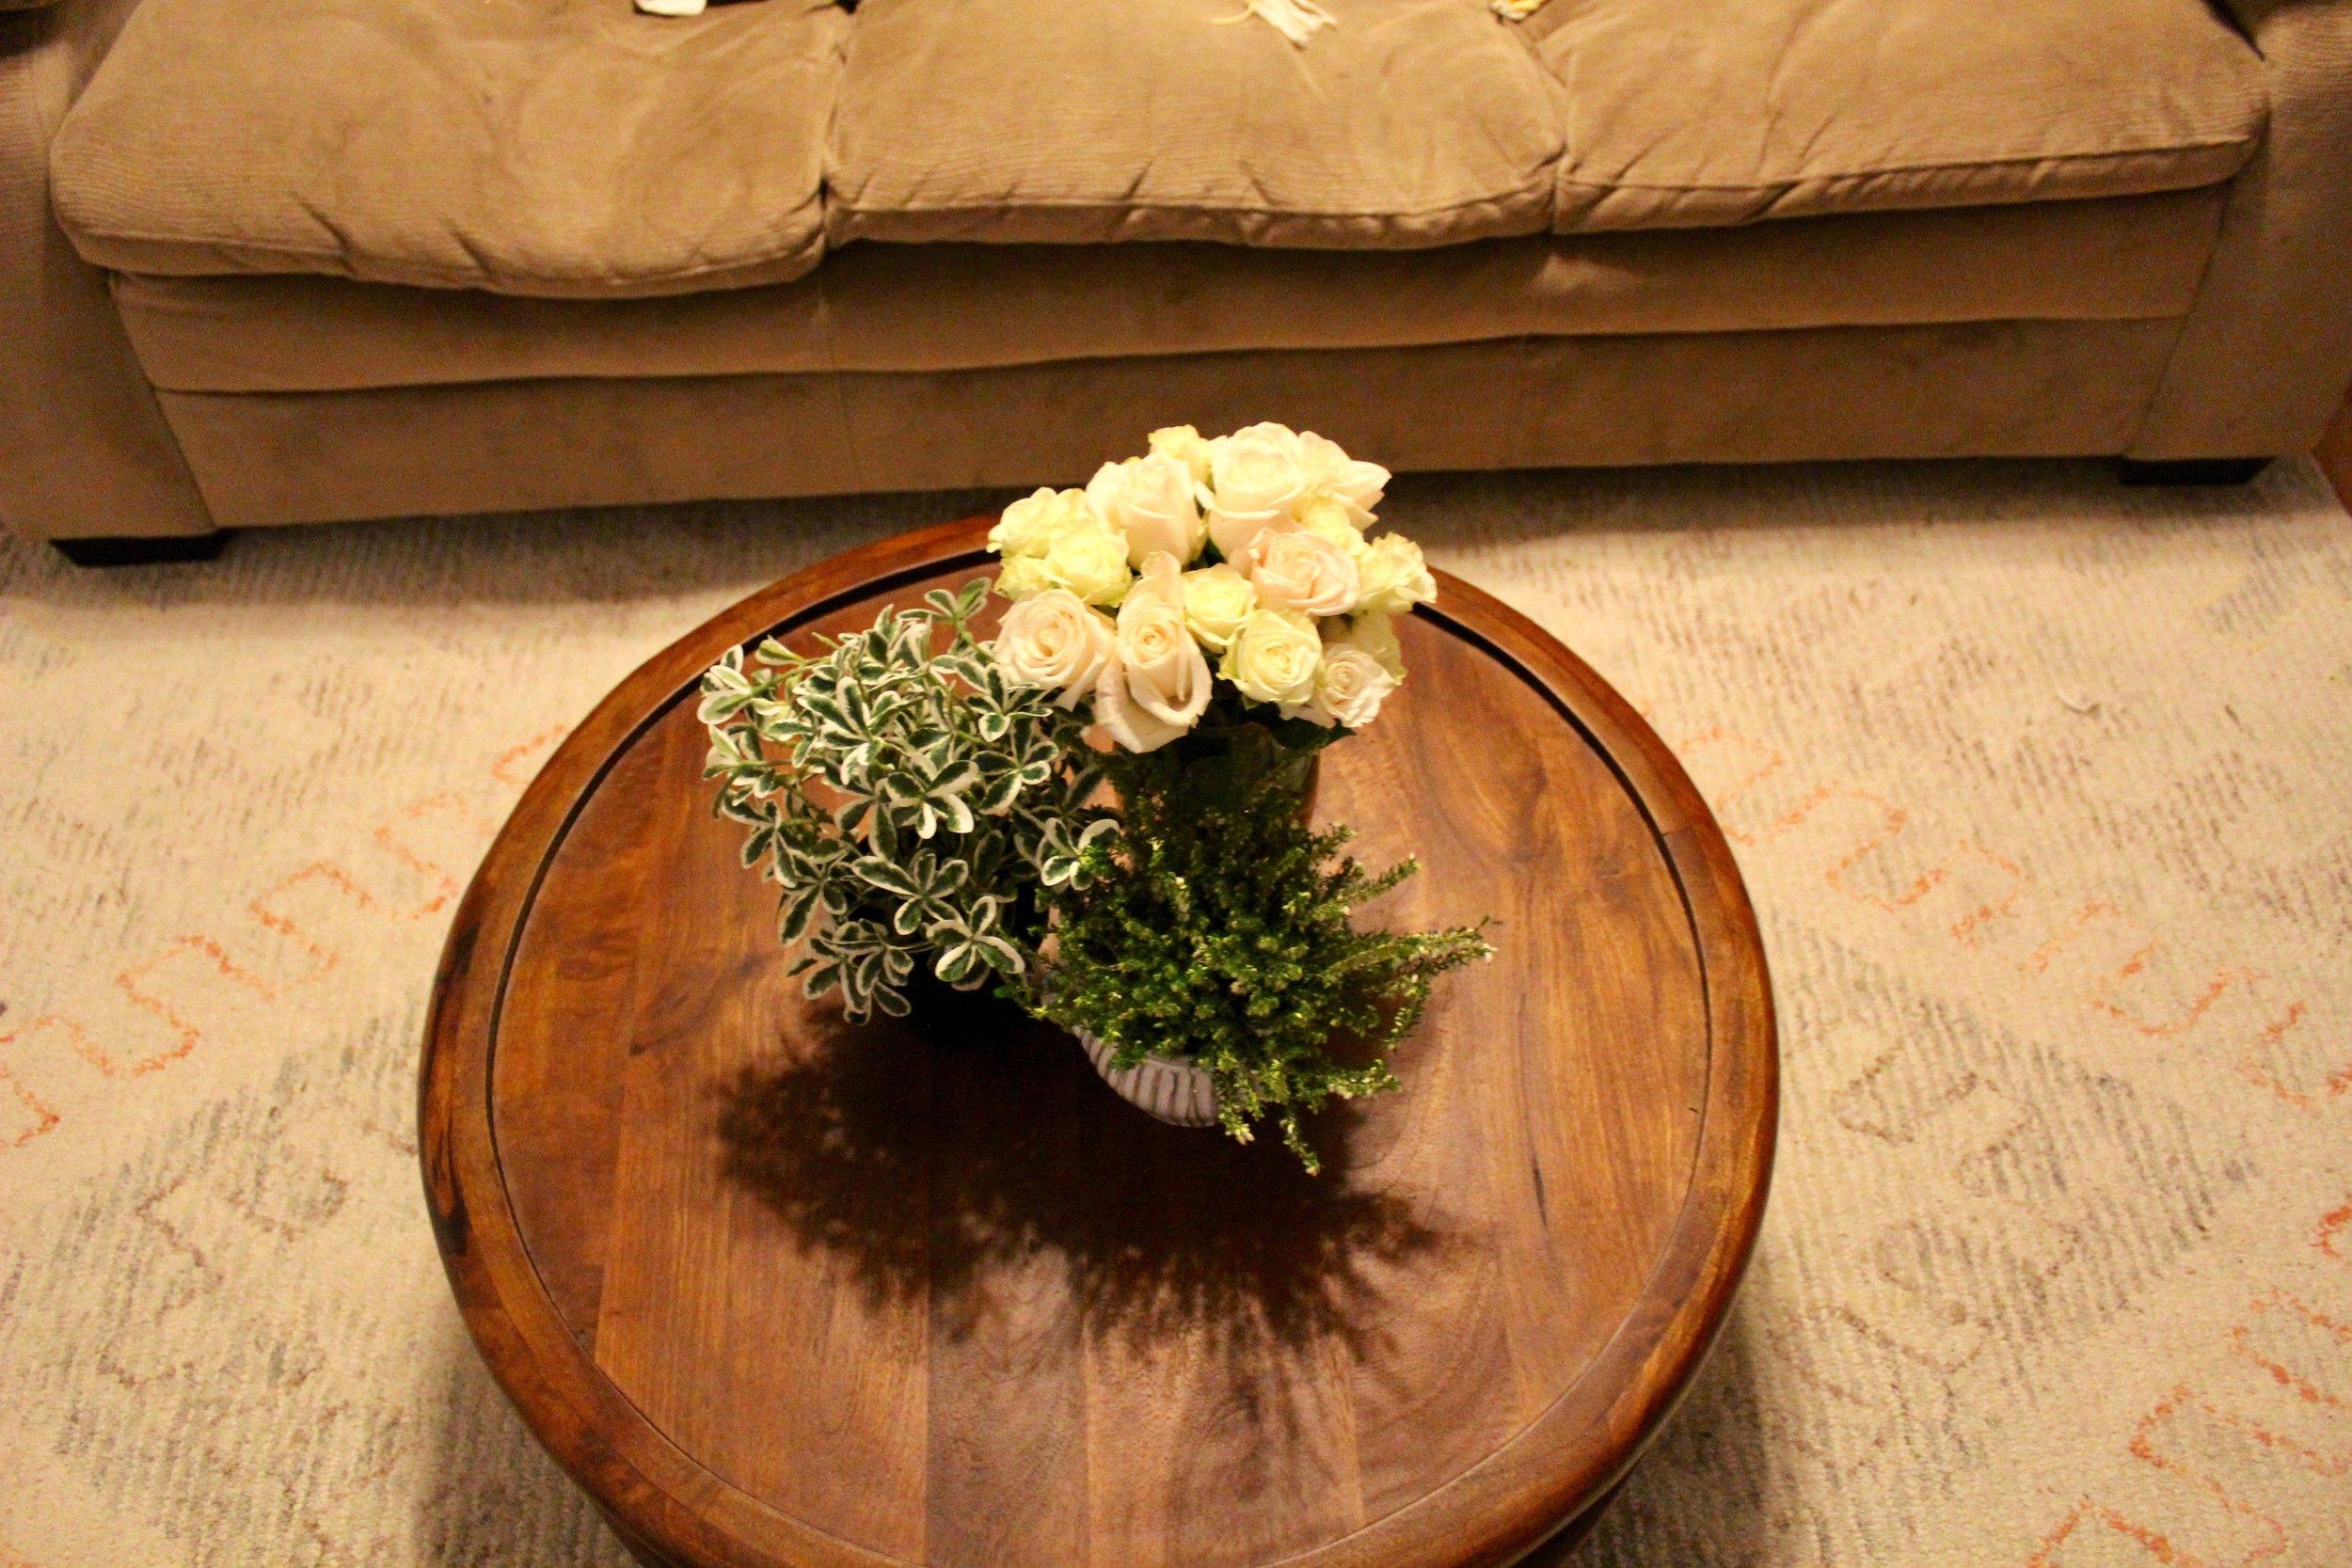 Arrangement #3 Tried a lush look with 3 plants, not quite minimalist enough